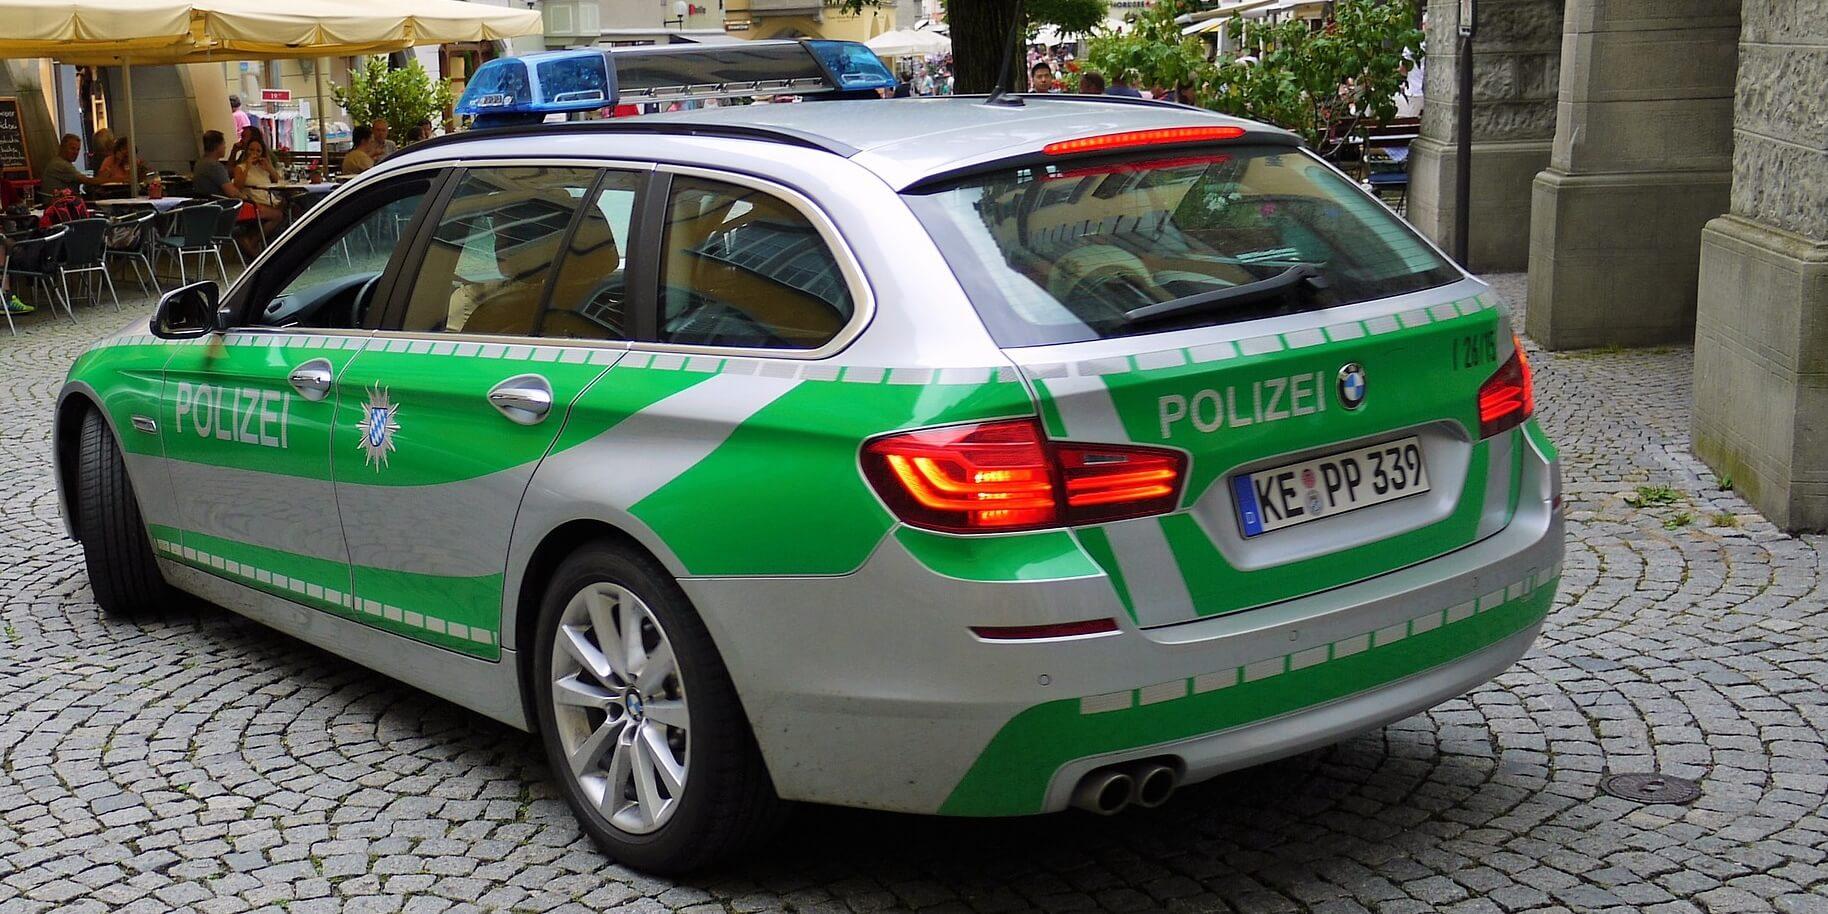 German-ALPR-Austria-ANPR-Number-Plate-Recognition for police surveillance